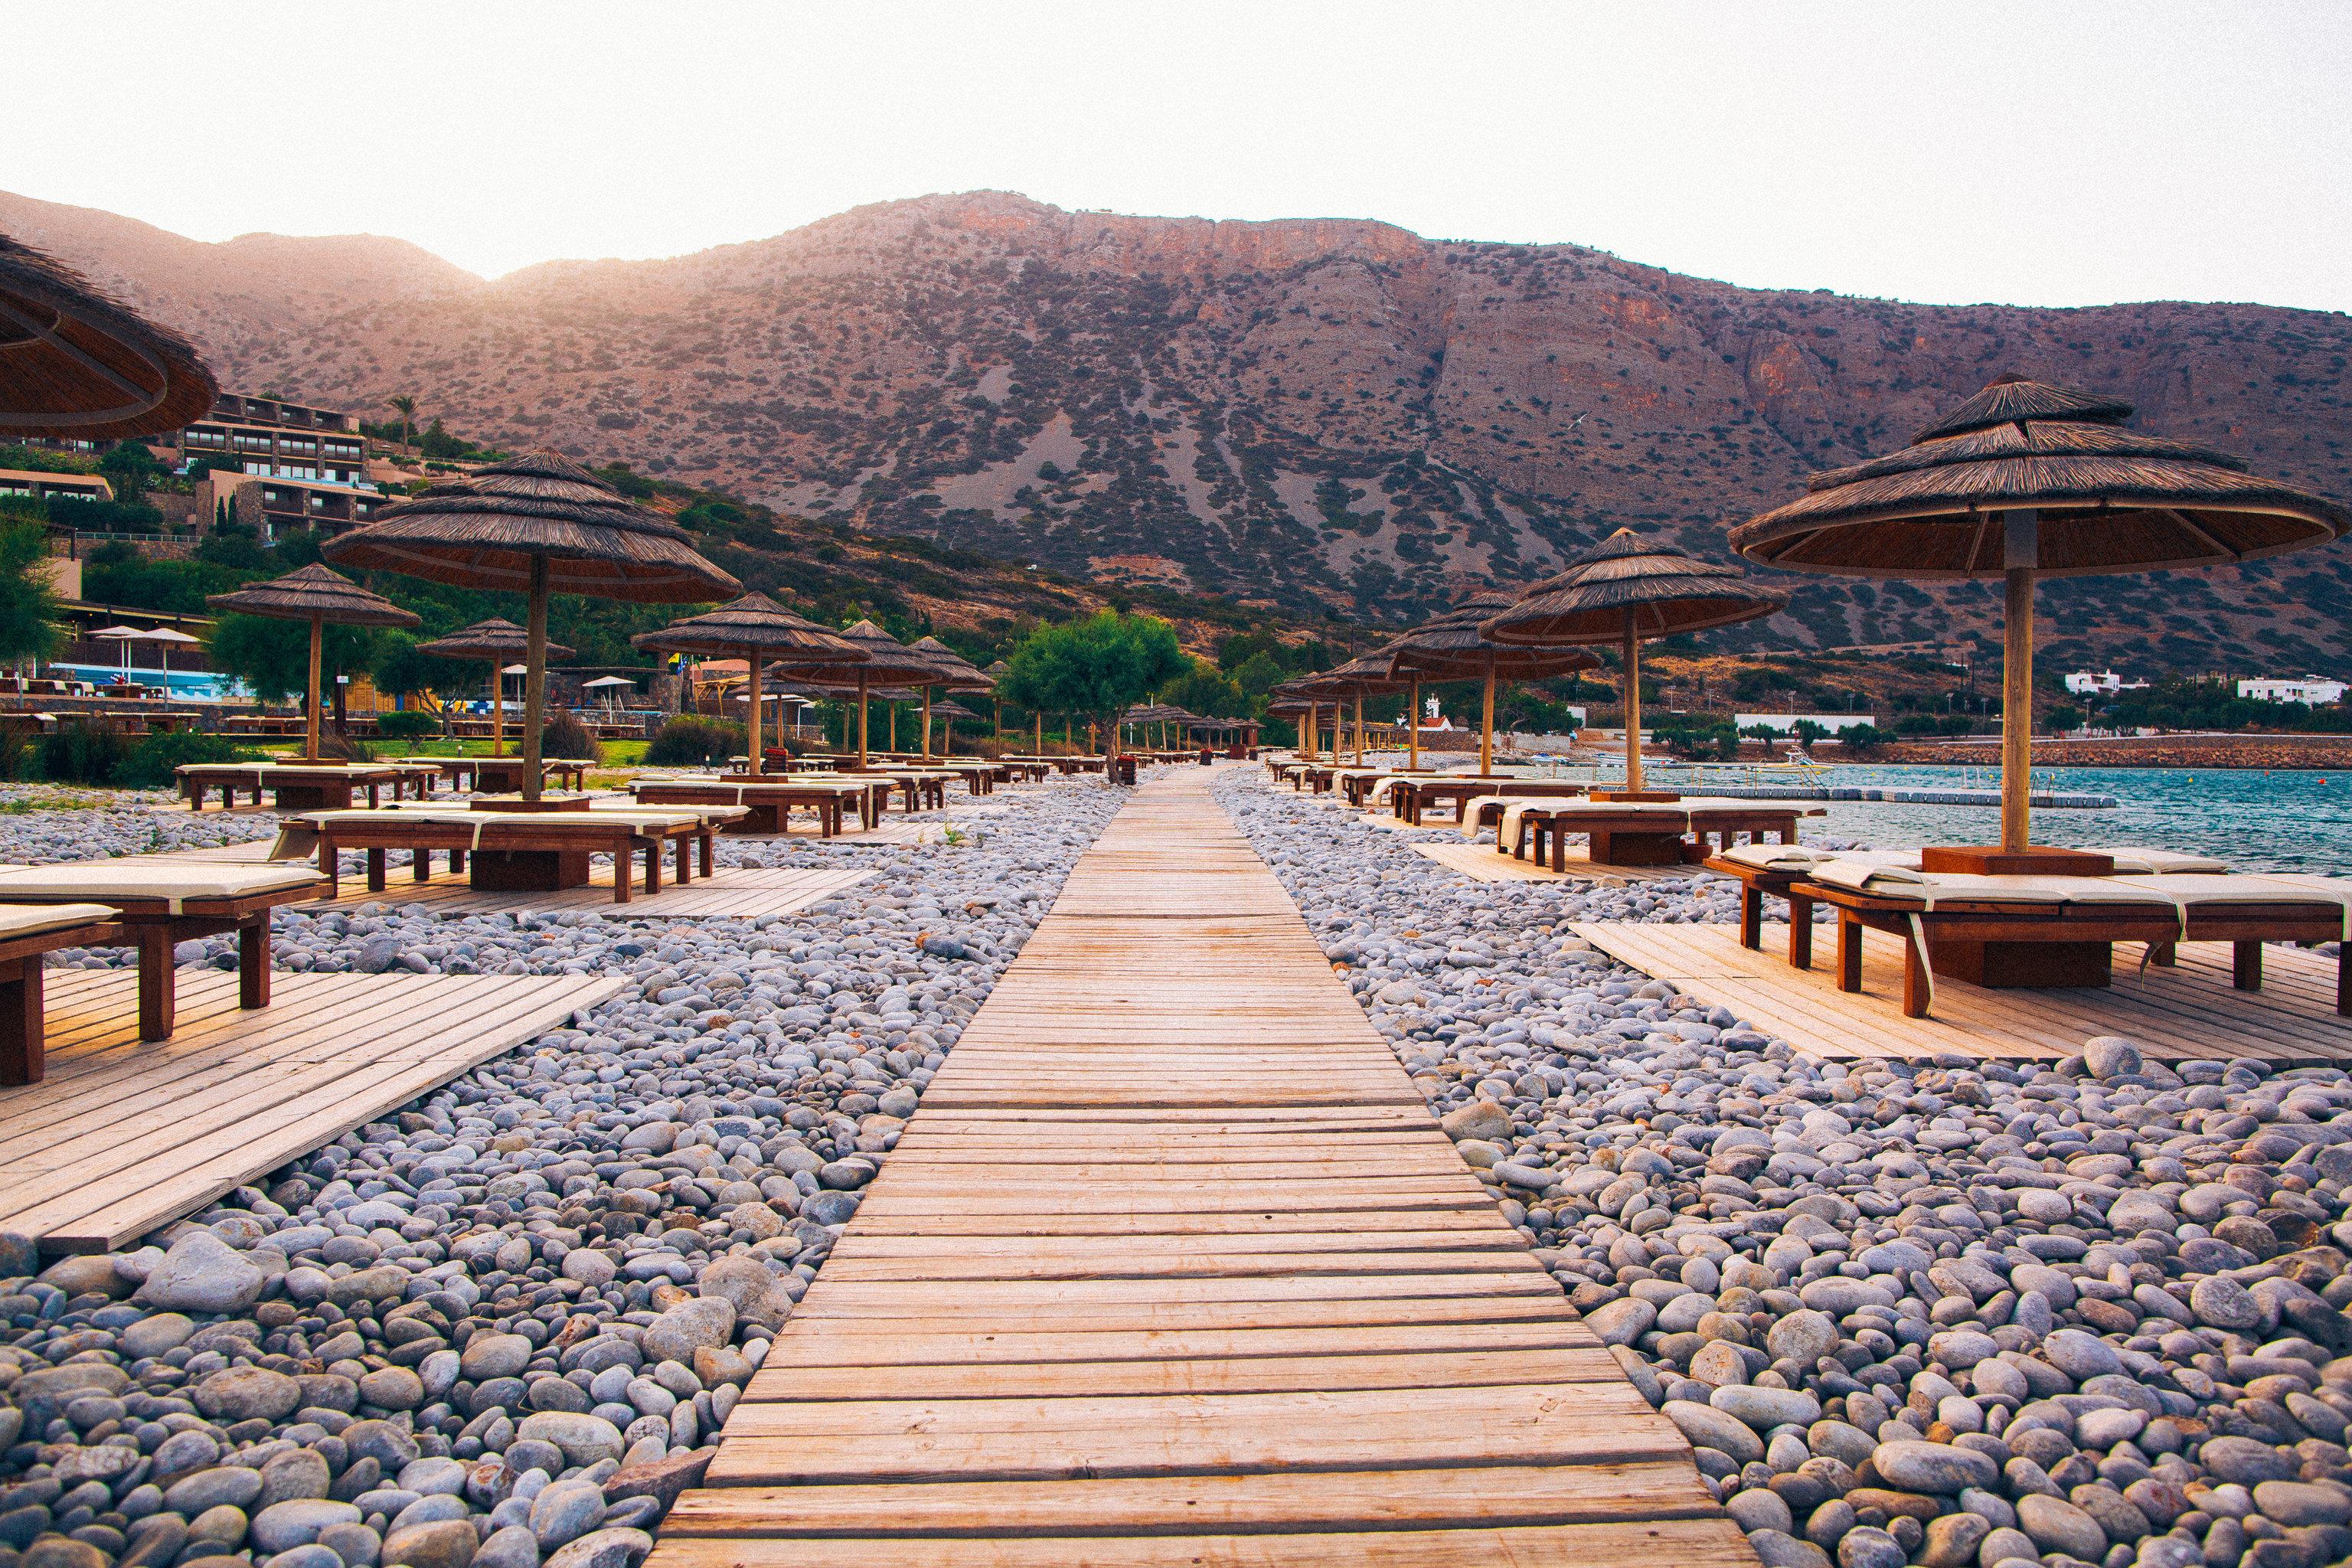 Hotels Romance mountain ground outdoor sky walkway Town Sea vacation Coast boardwalk landscape Beach Lake set